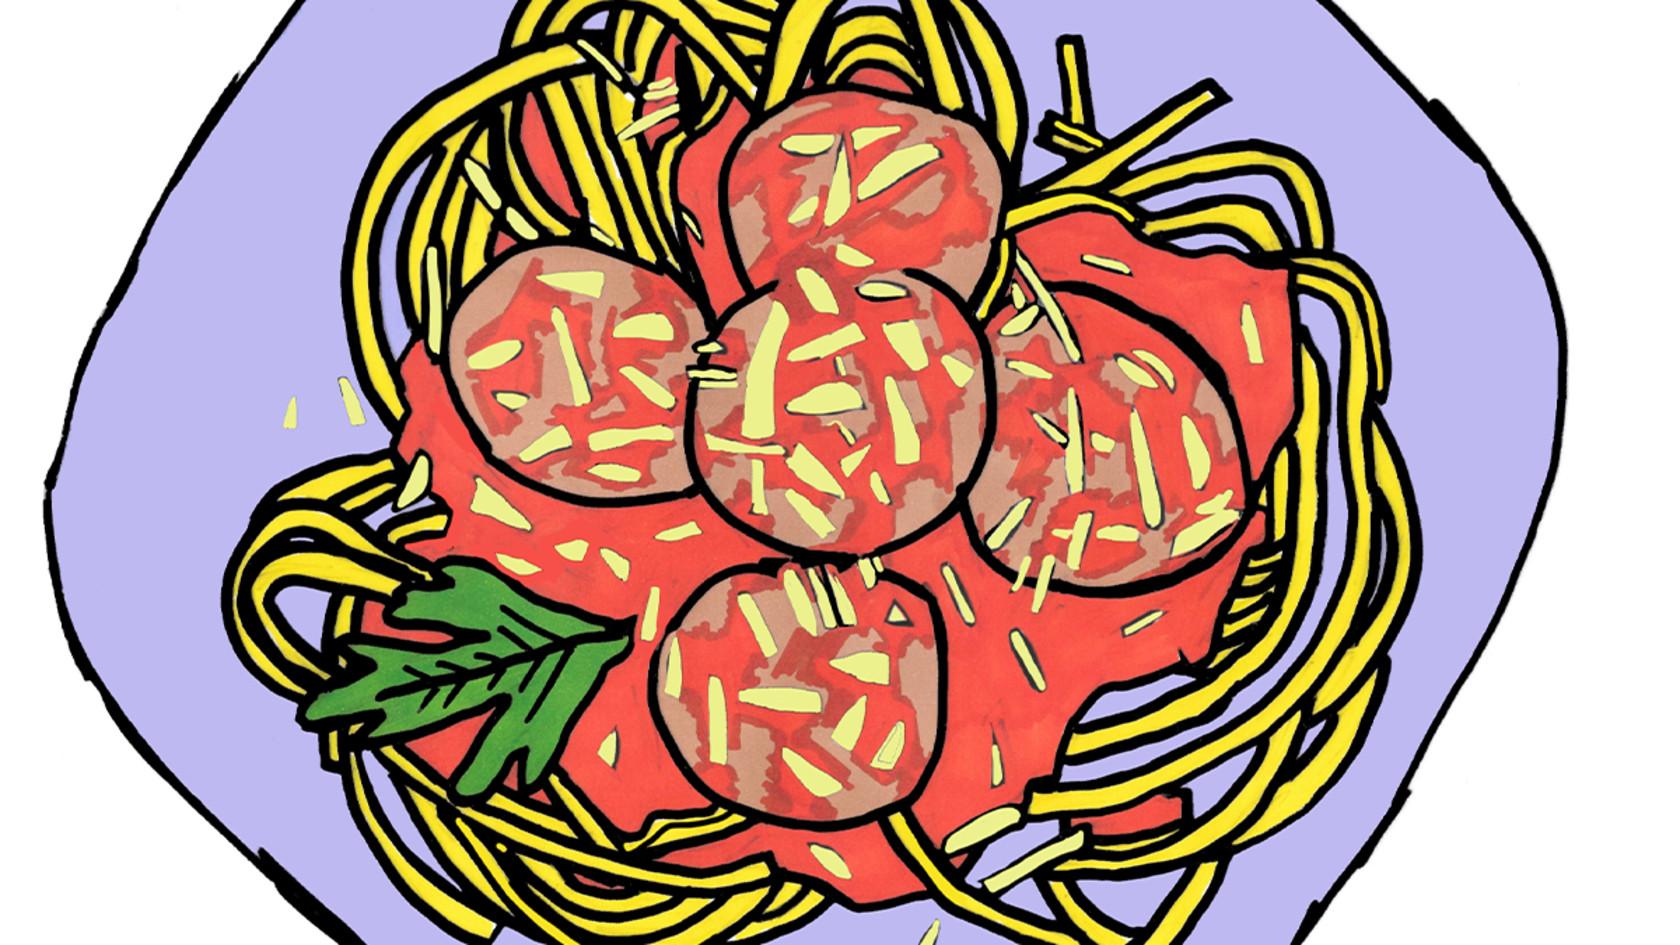 Meatballs 1200x675